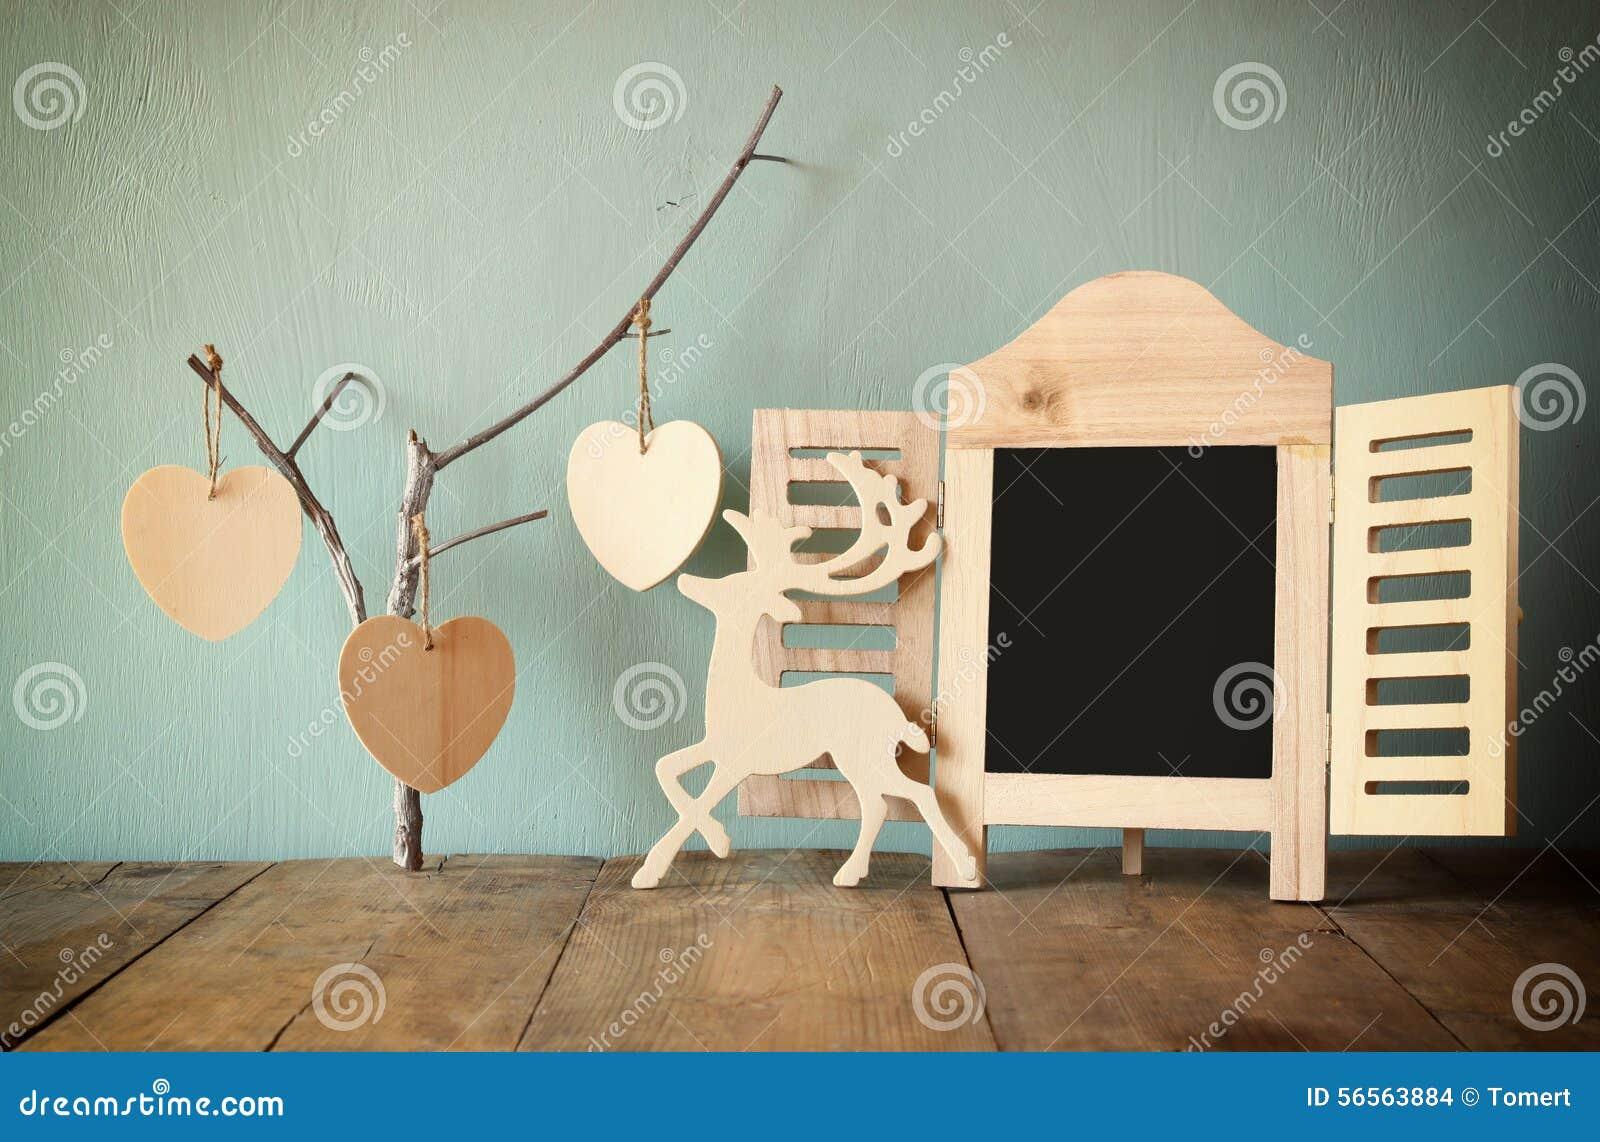 Download Διακοσμητικό πλαίσιο πινάκων κιμωλίας και ξύλινες κρεμώντας καρδιές πέρα από τον ξύλινο πίνακα έτοιμος για το κείμενο ή το πρότυπ Στοκ Εικόνες - εικόνα από ένωση, αγάπη: 56563884